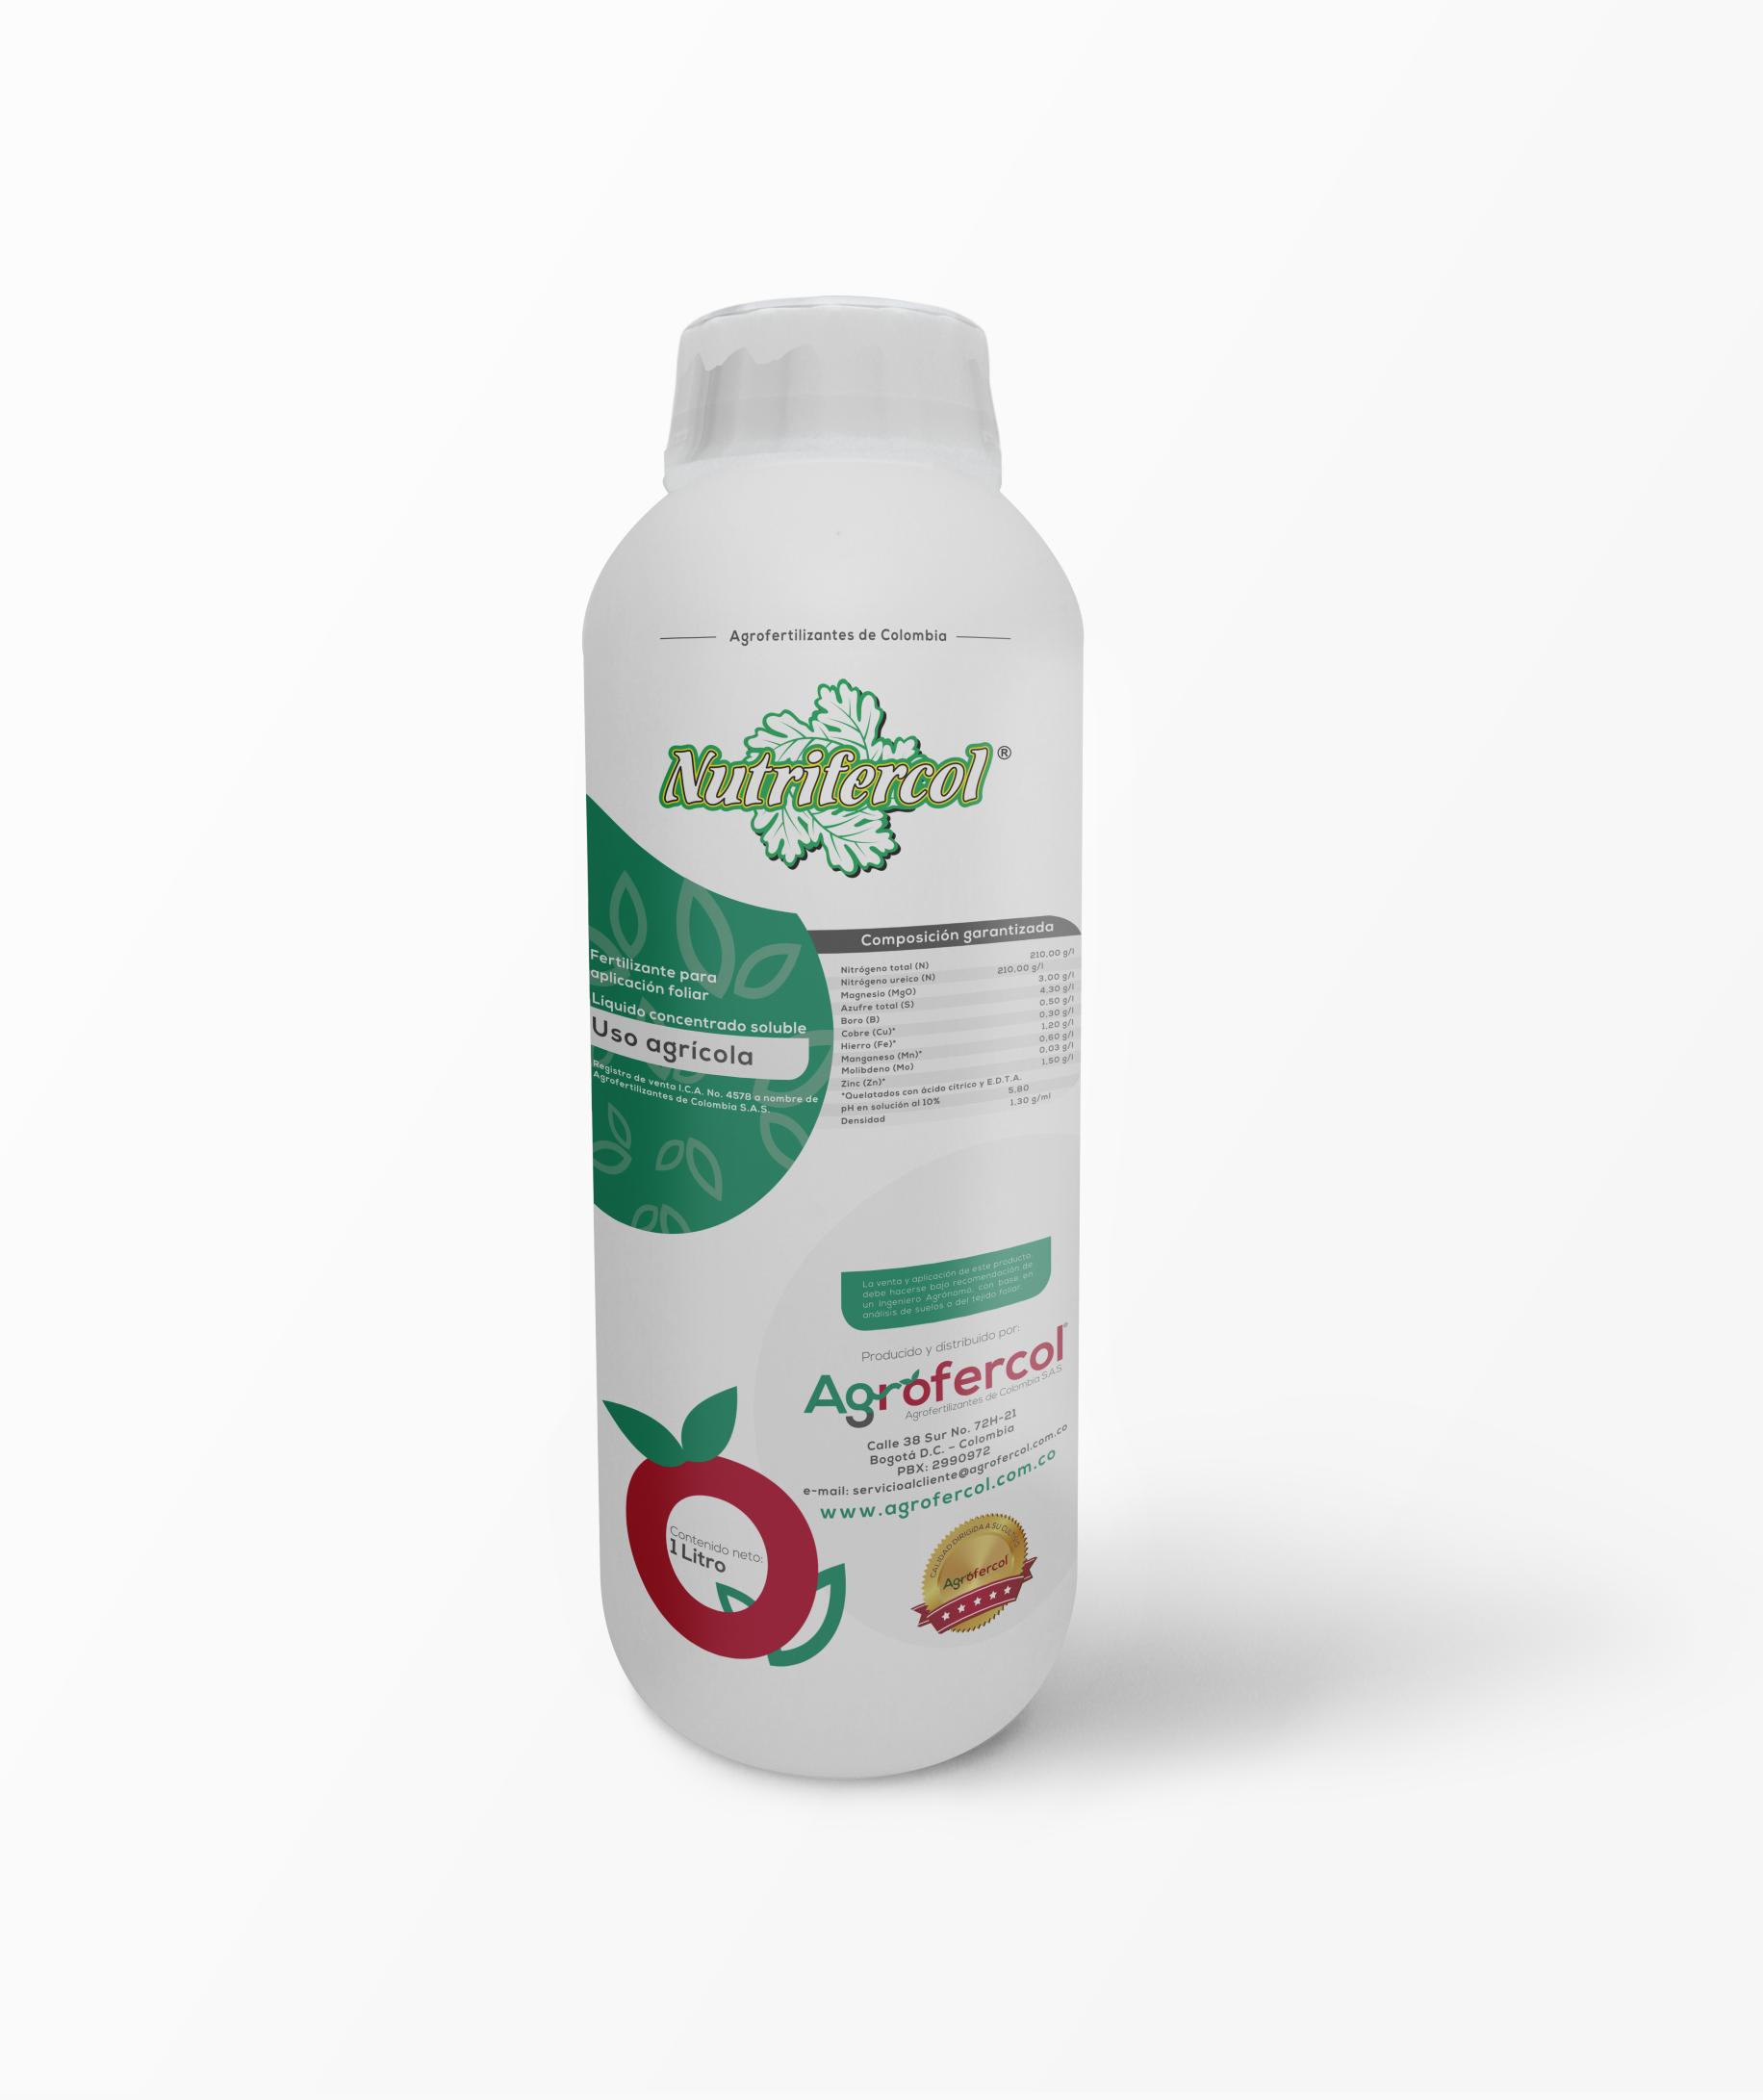 Fertilizante-Foliar-Nutrifercol-Agrofercol-(Frontal).png